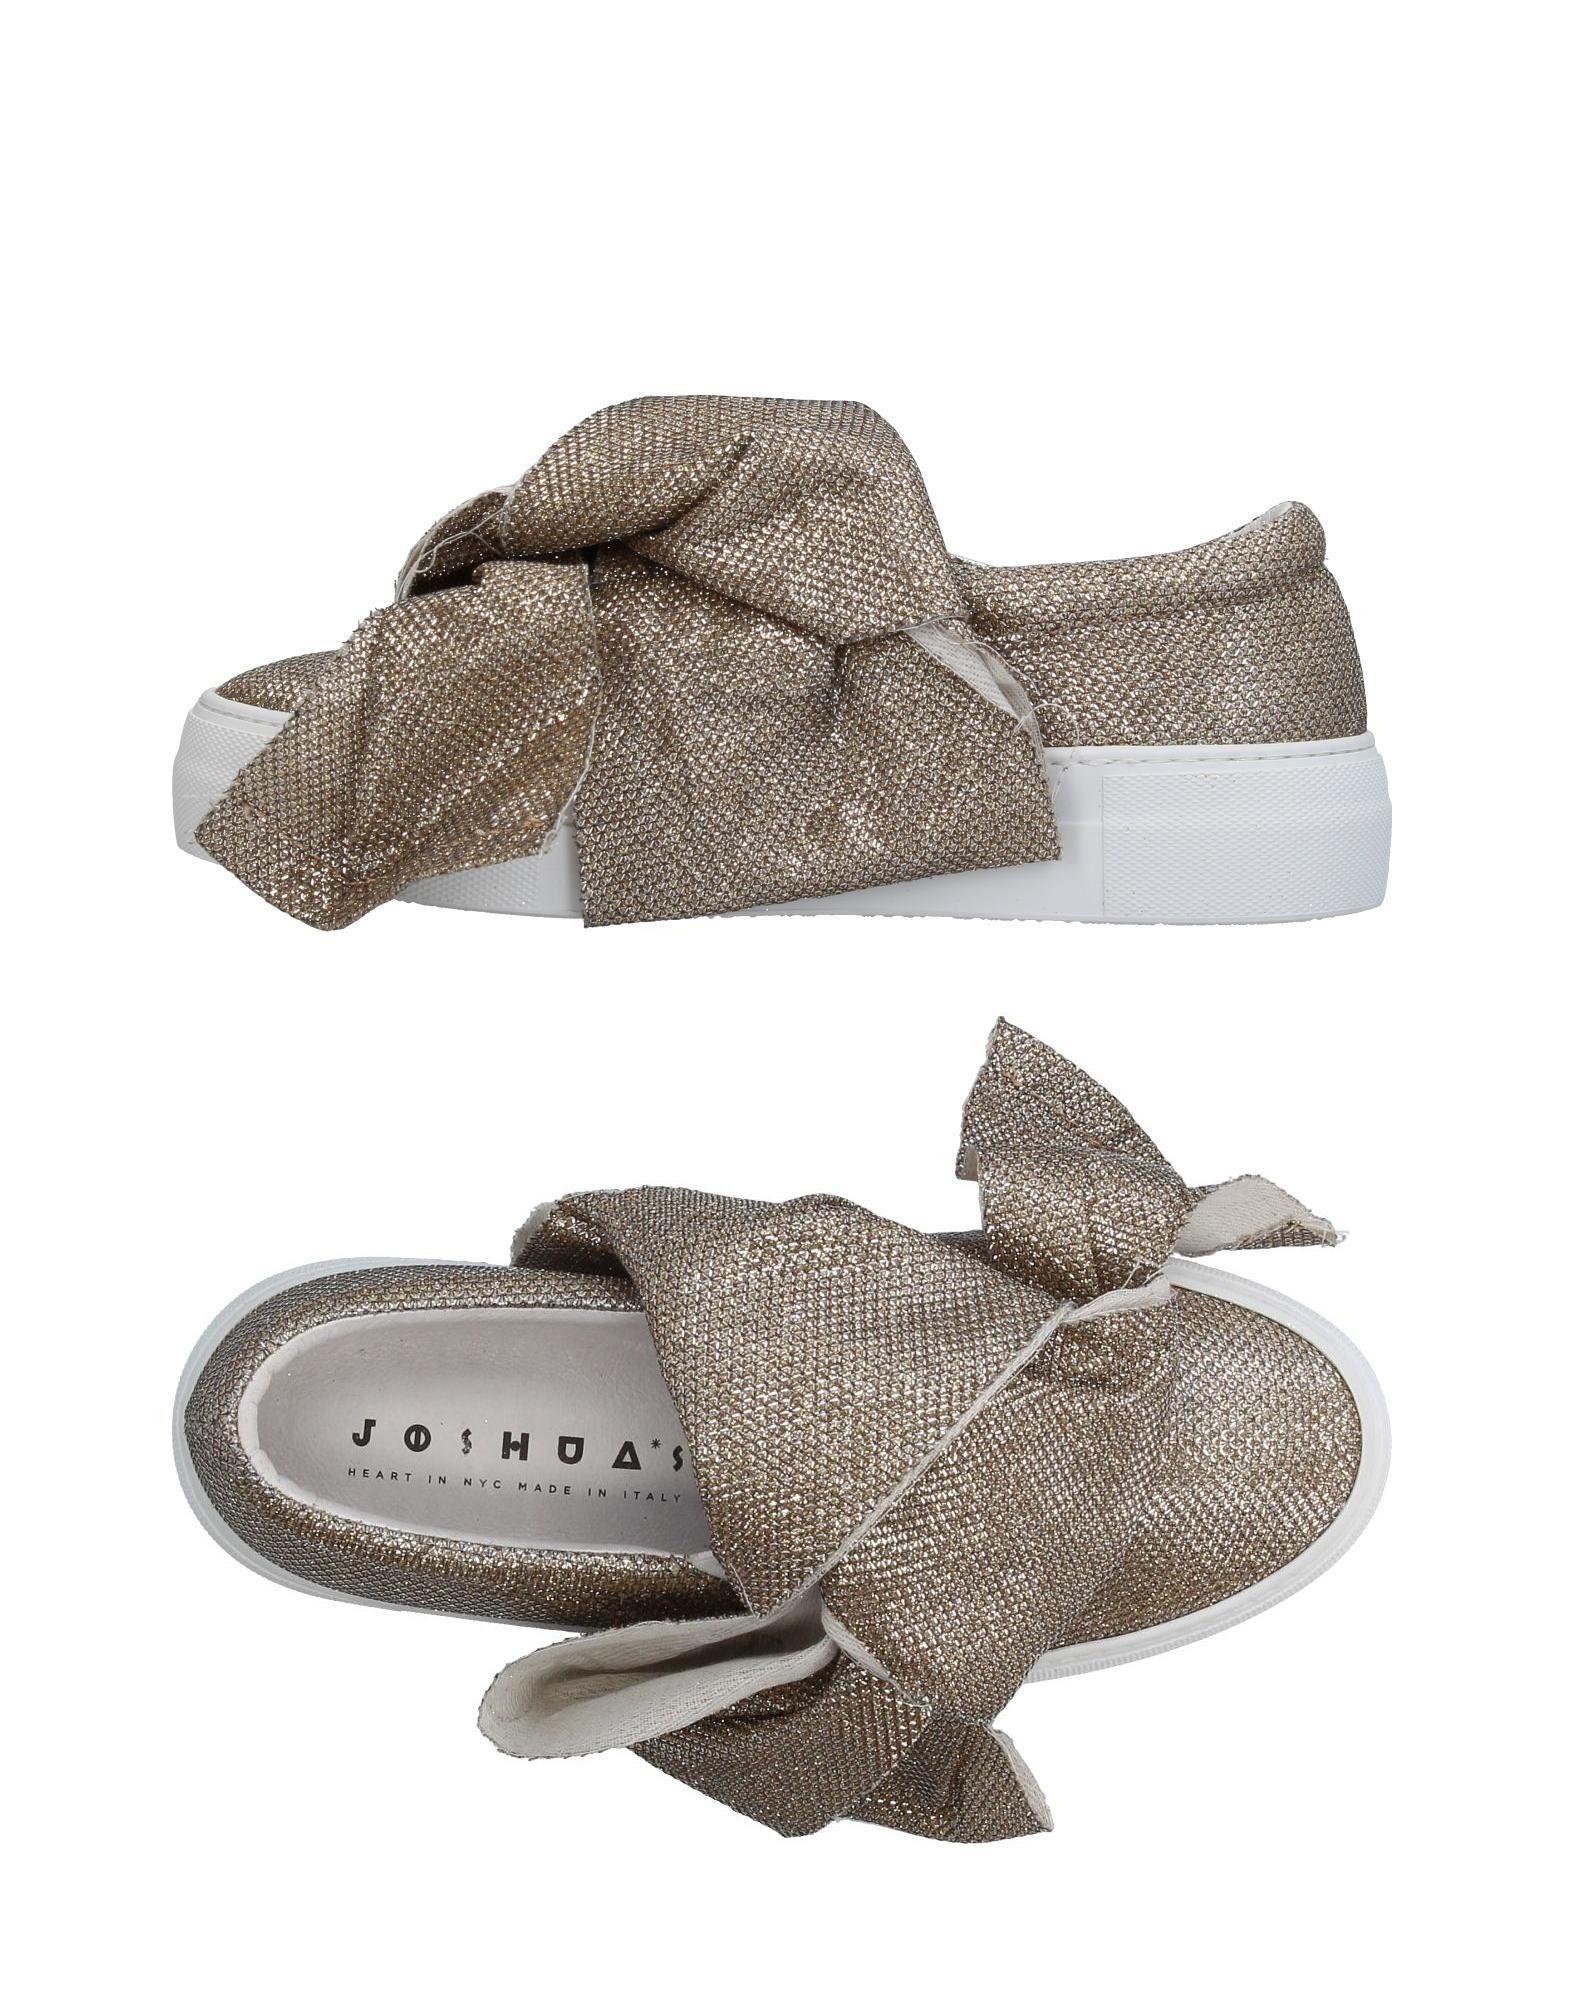 Joshua*S Sneakers Damen  11367524BKGut aussehende strapazierfähige Schuhe